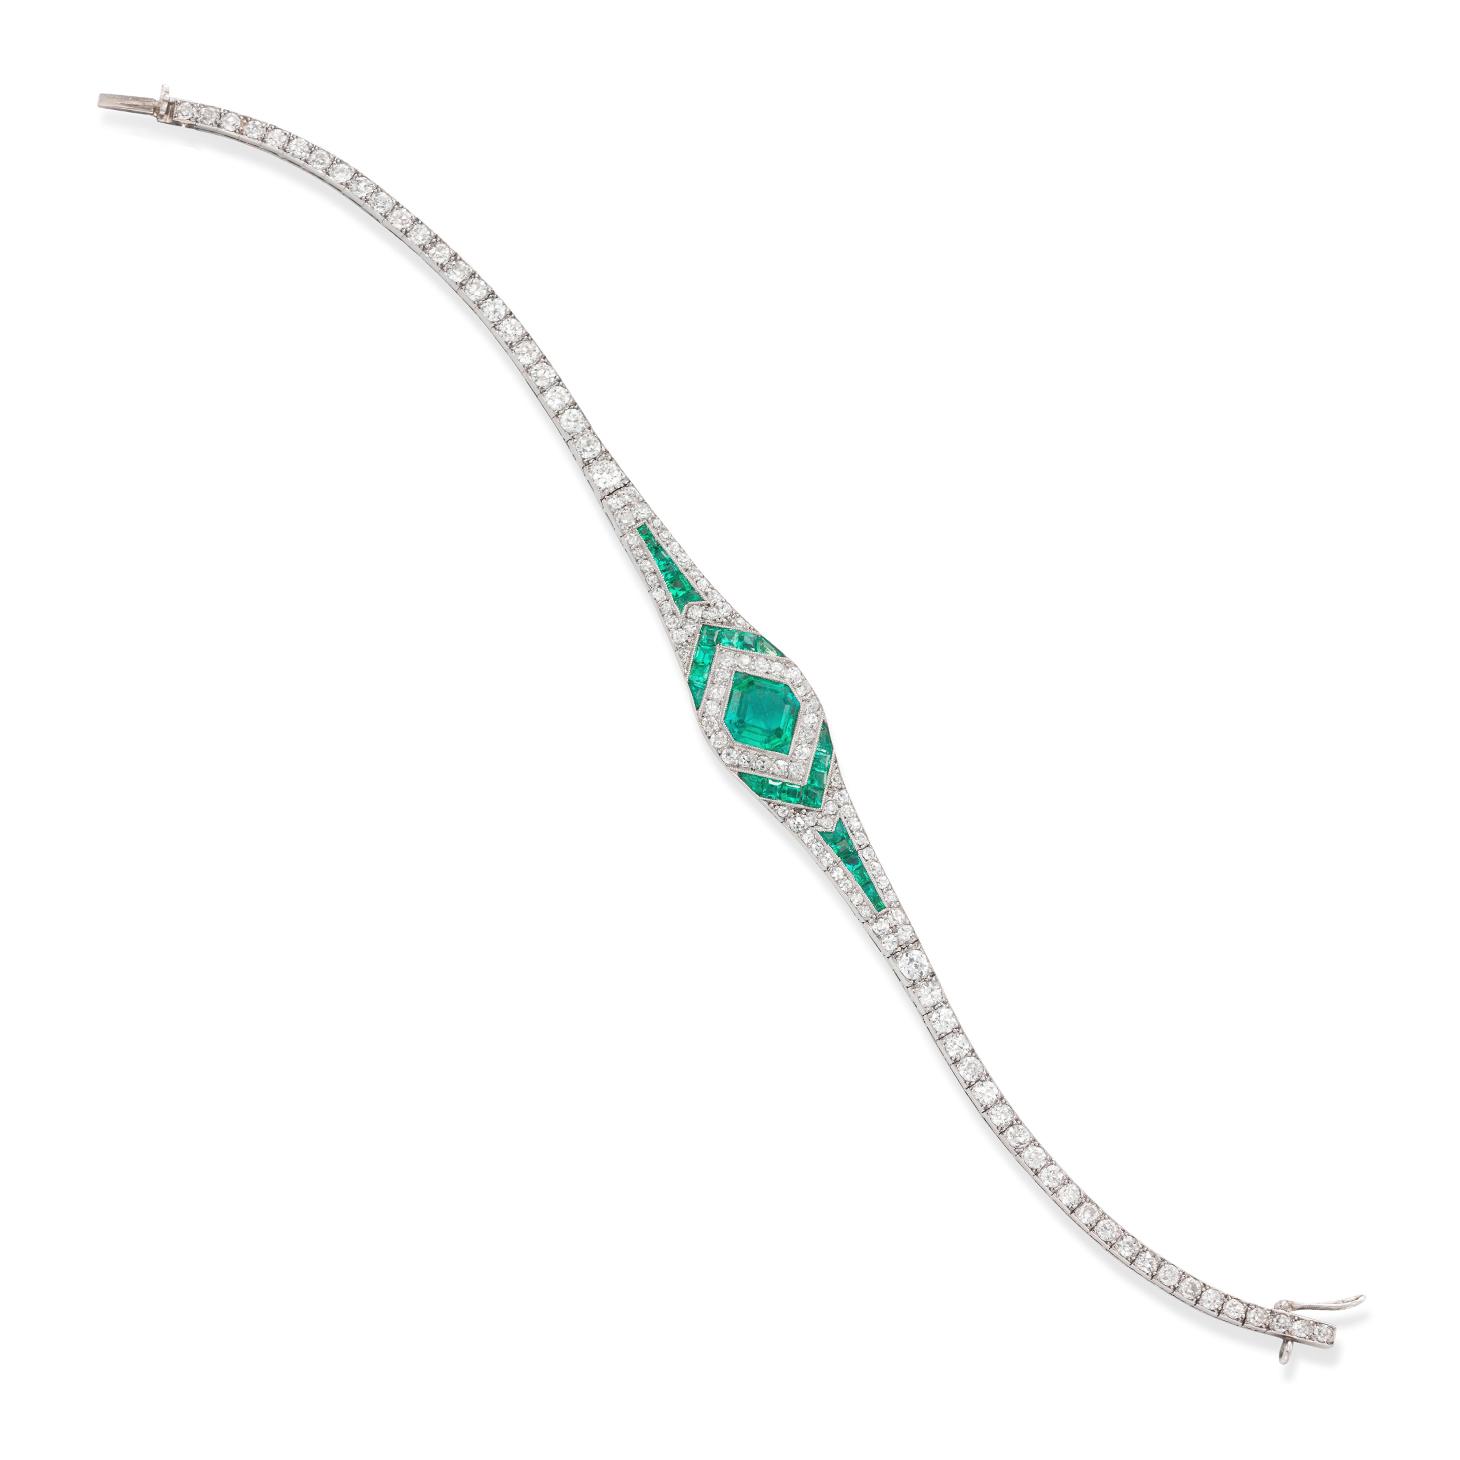 An Art Deco Emerald and Diamond Bracelet, by Georges Thibault, circa 1925